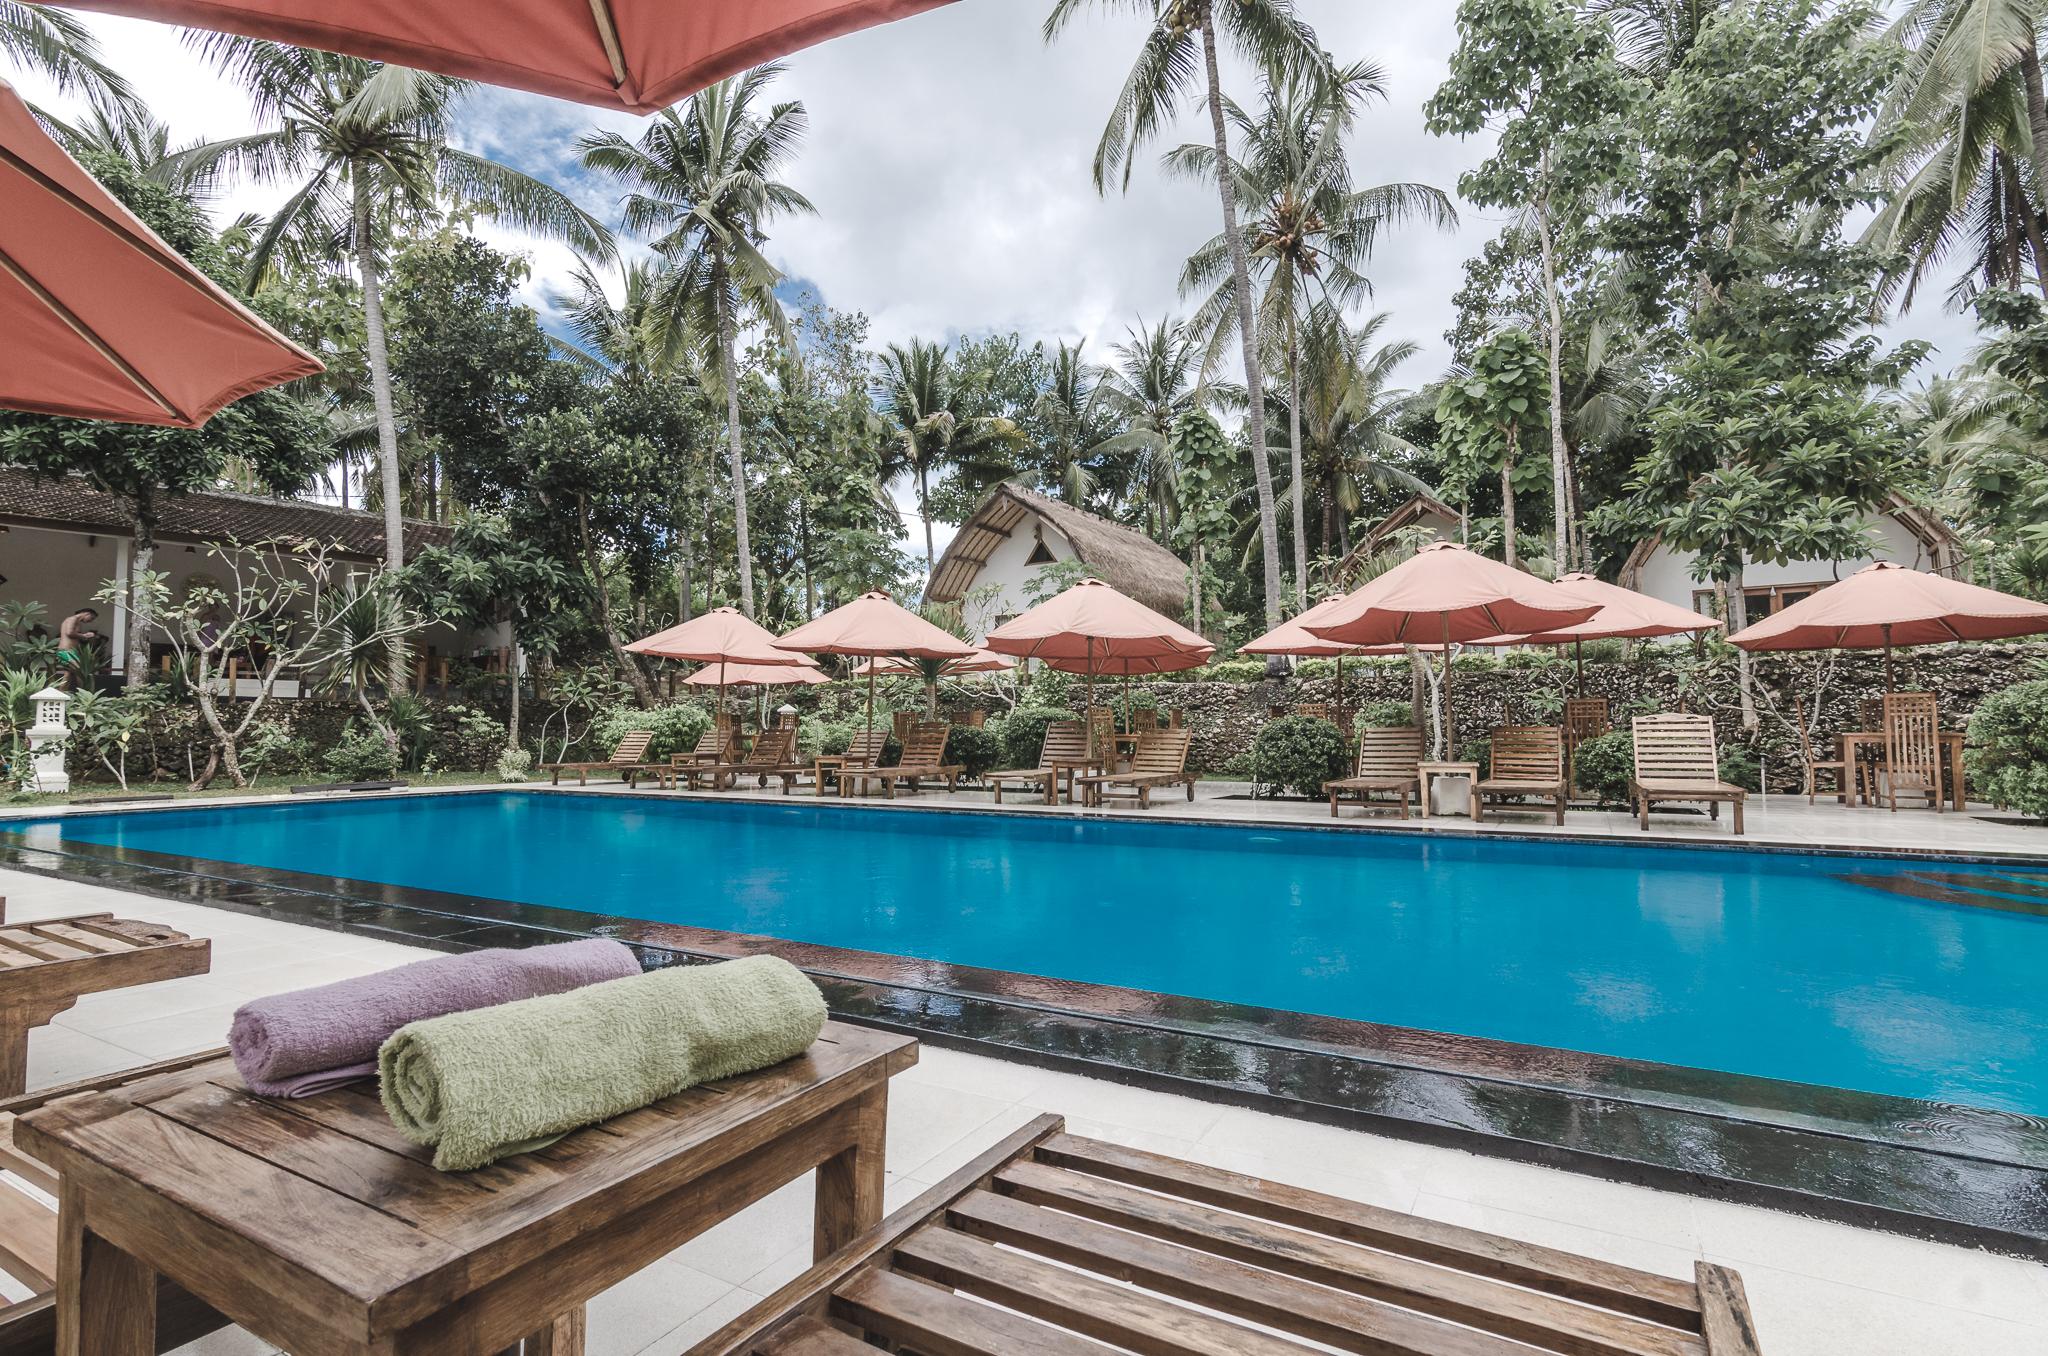 coco-resort-nusa-penida-bali-outdoor-pool.jpg